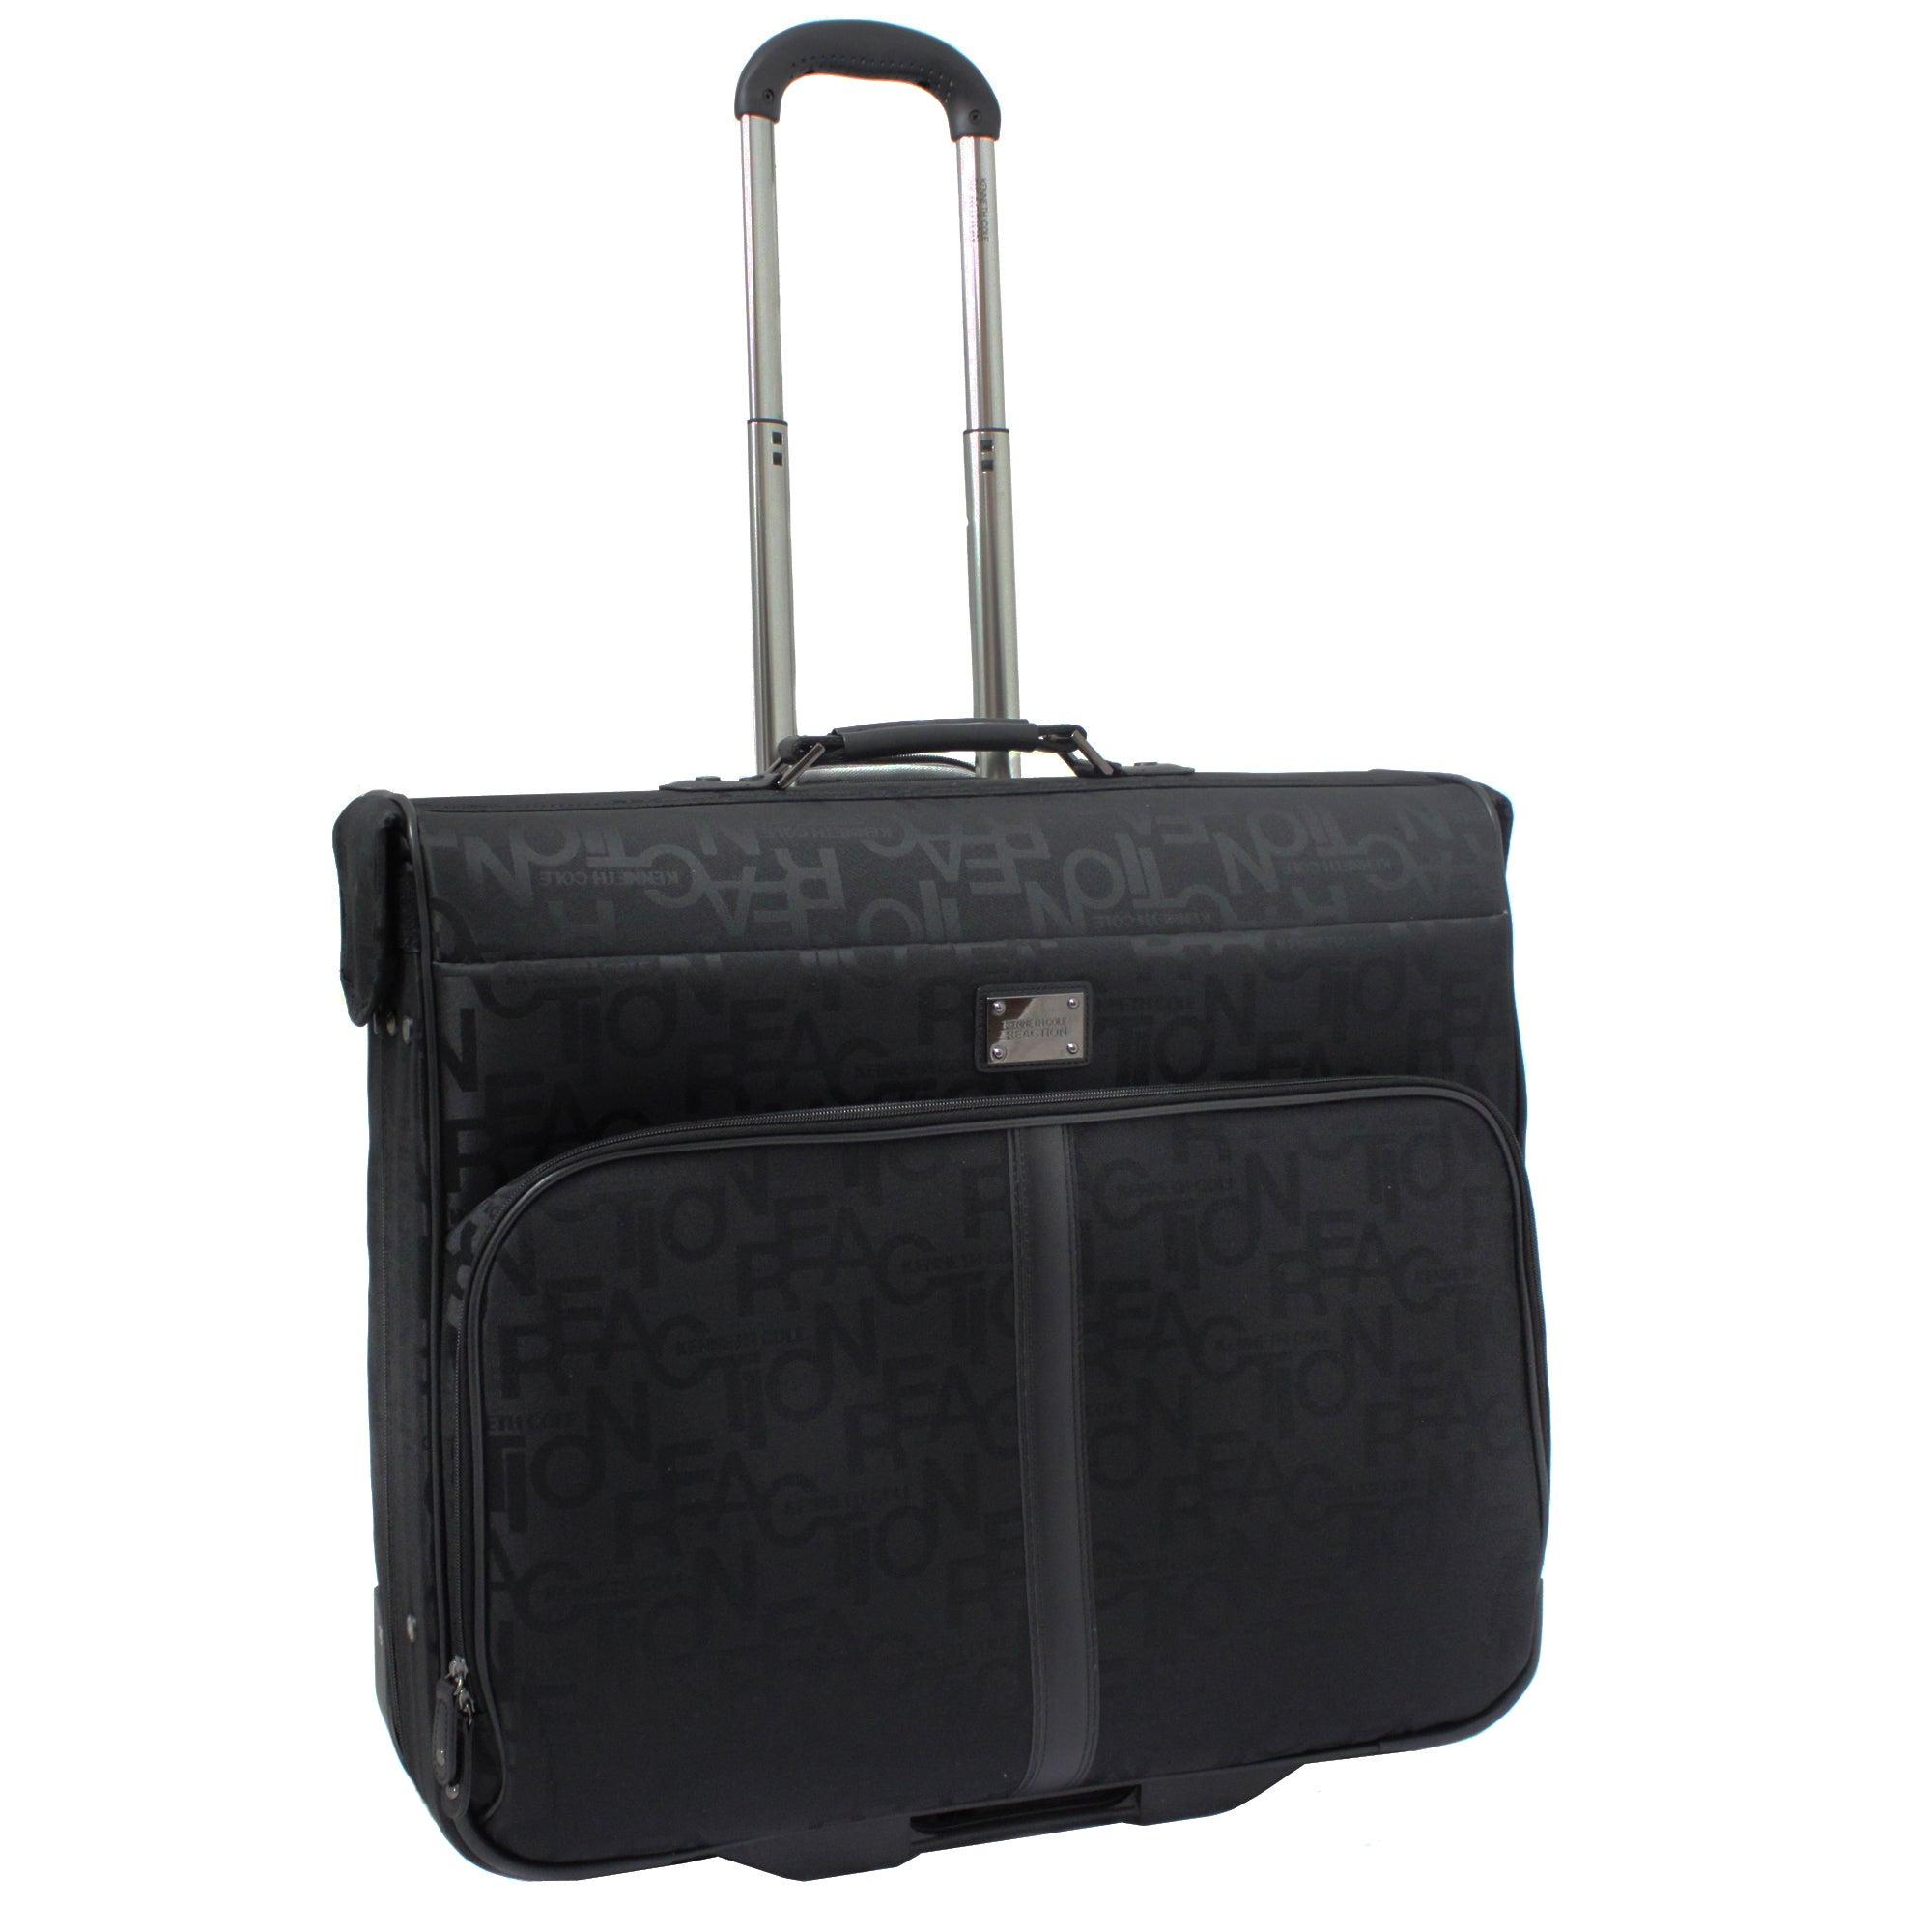 Kenneth Cole Reaction 'Taking Flight' Black Wheeled Garment Bag